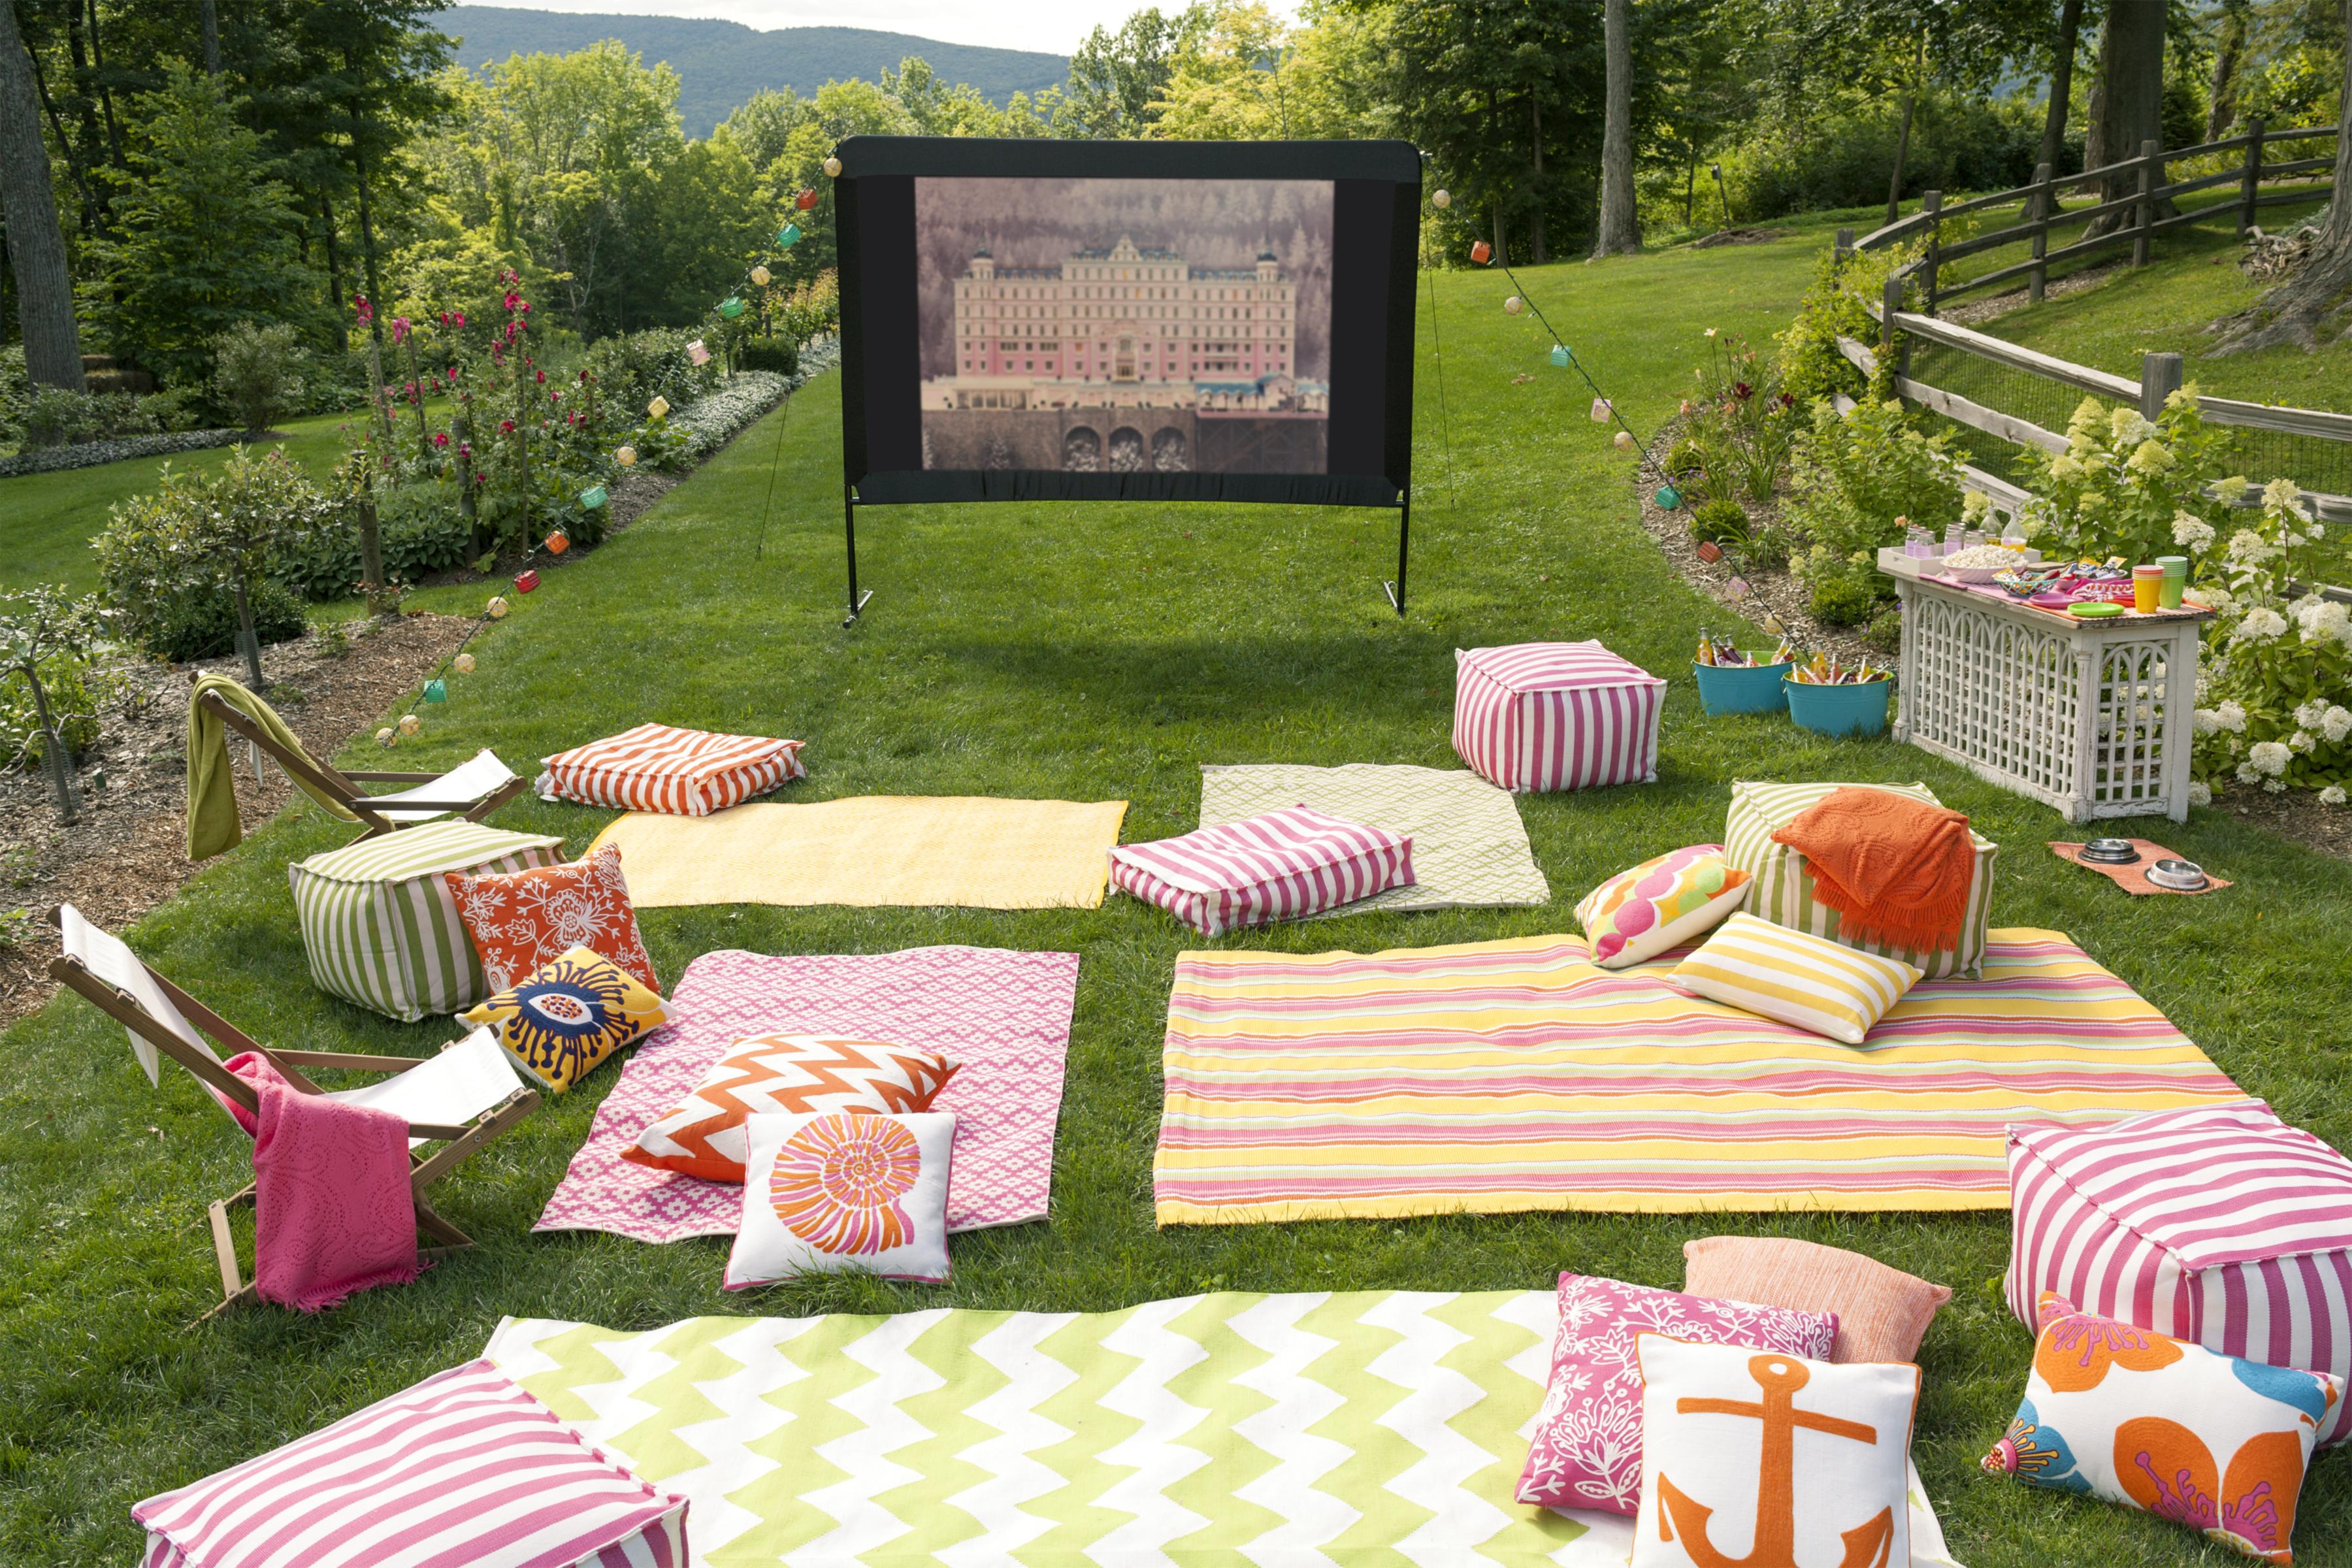 genius outdoor movie ideas the girl creative